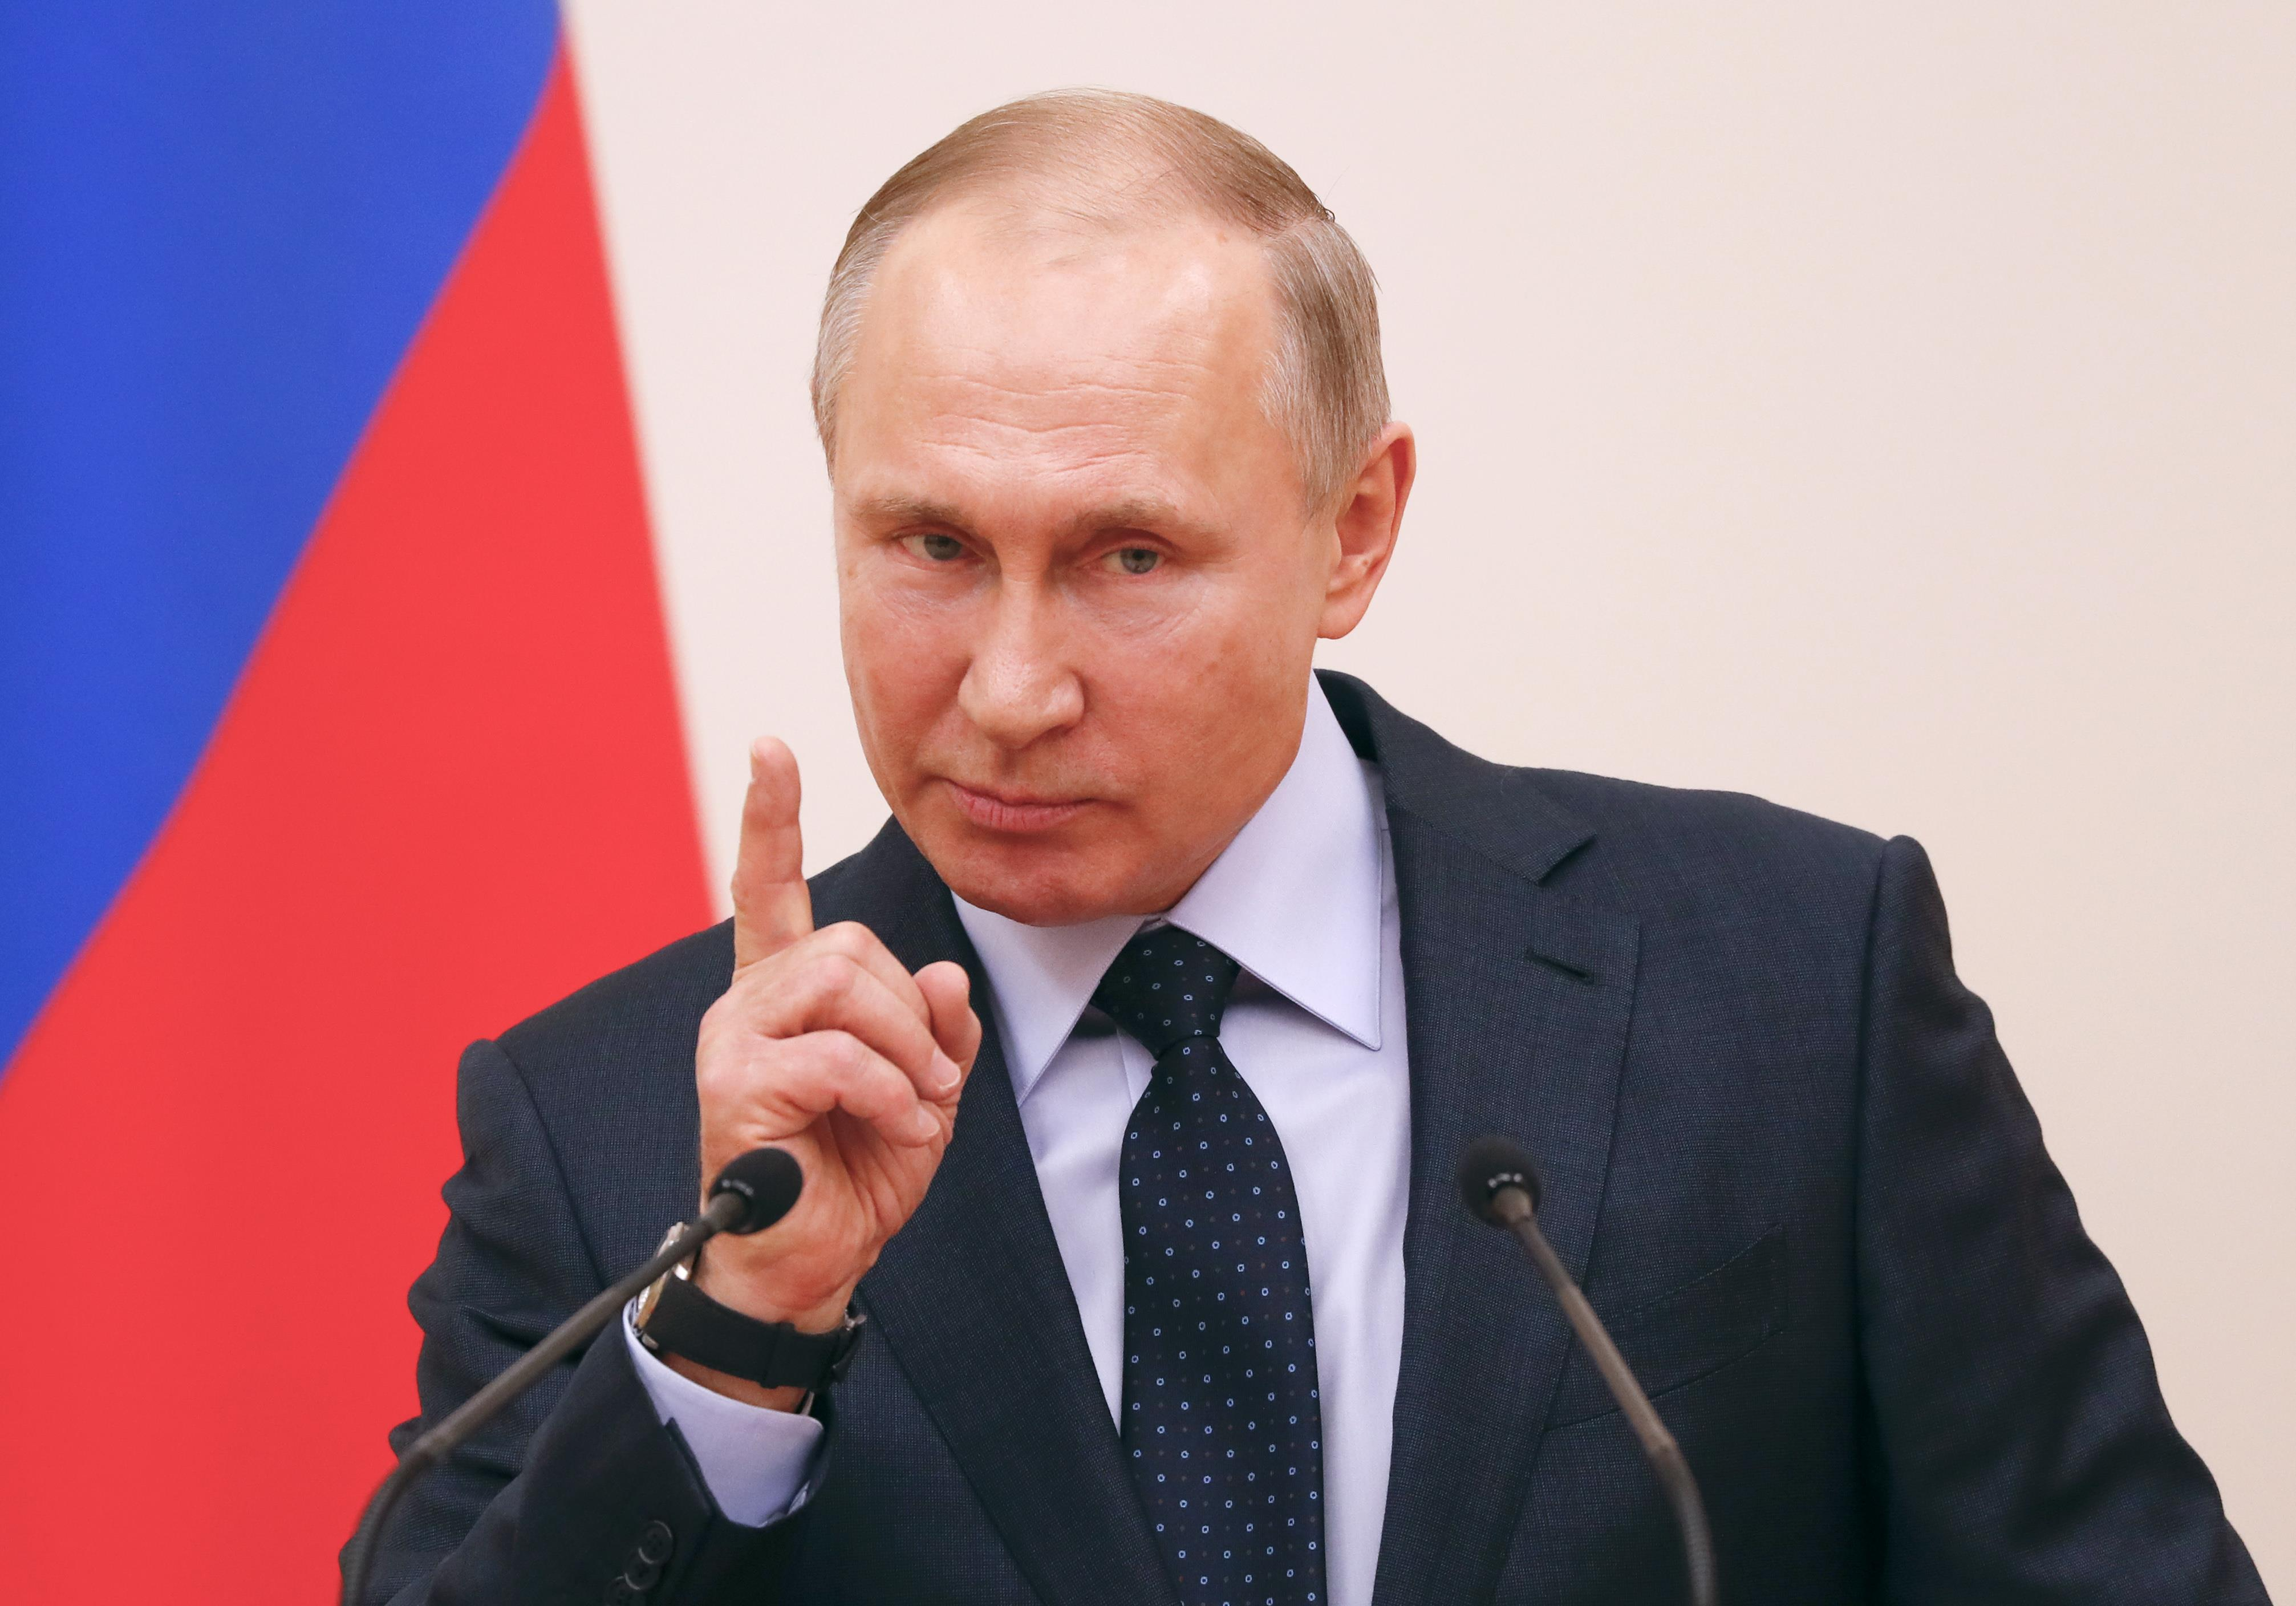 Владимир Путин, говоря о санкциях,